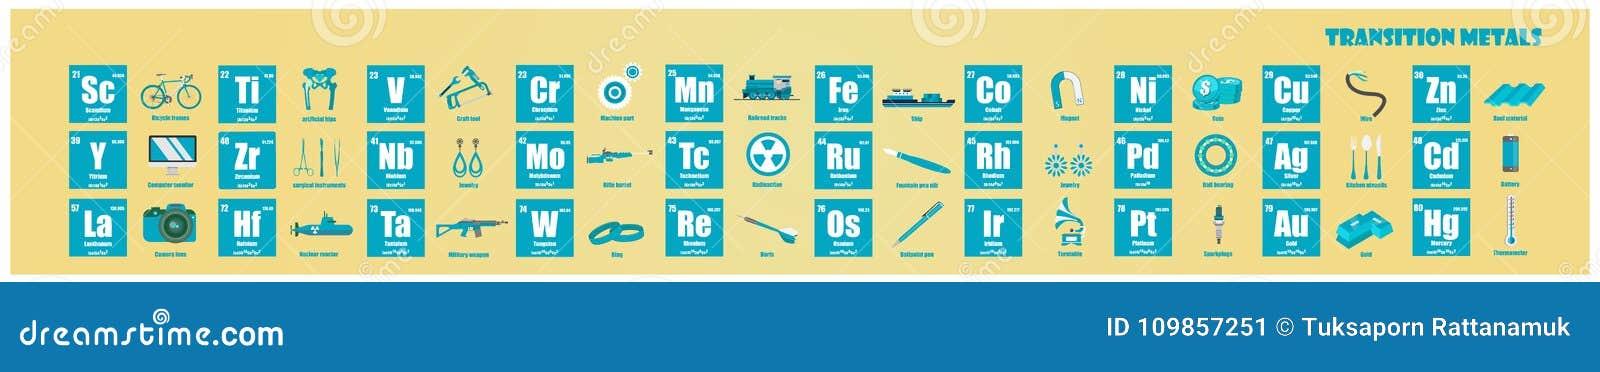 Periodic table of element transition metals stock illustration periodic table of element transition metals urtaz Choice Image